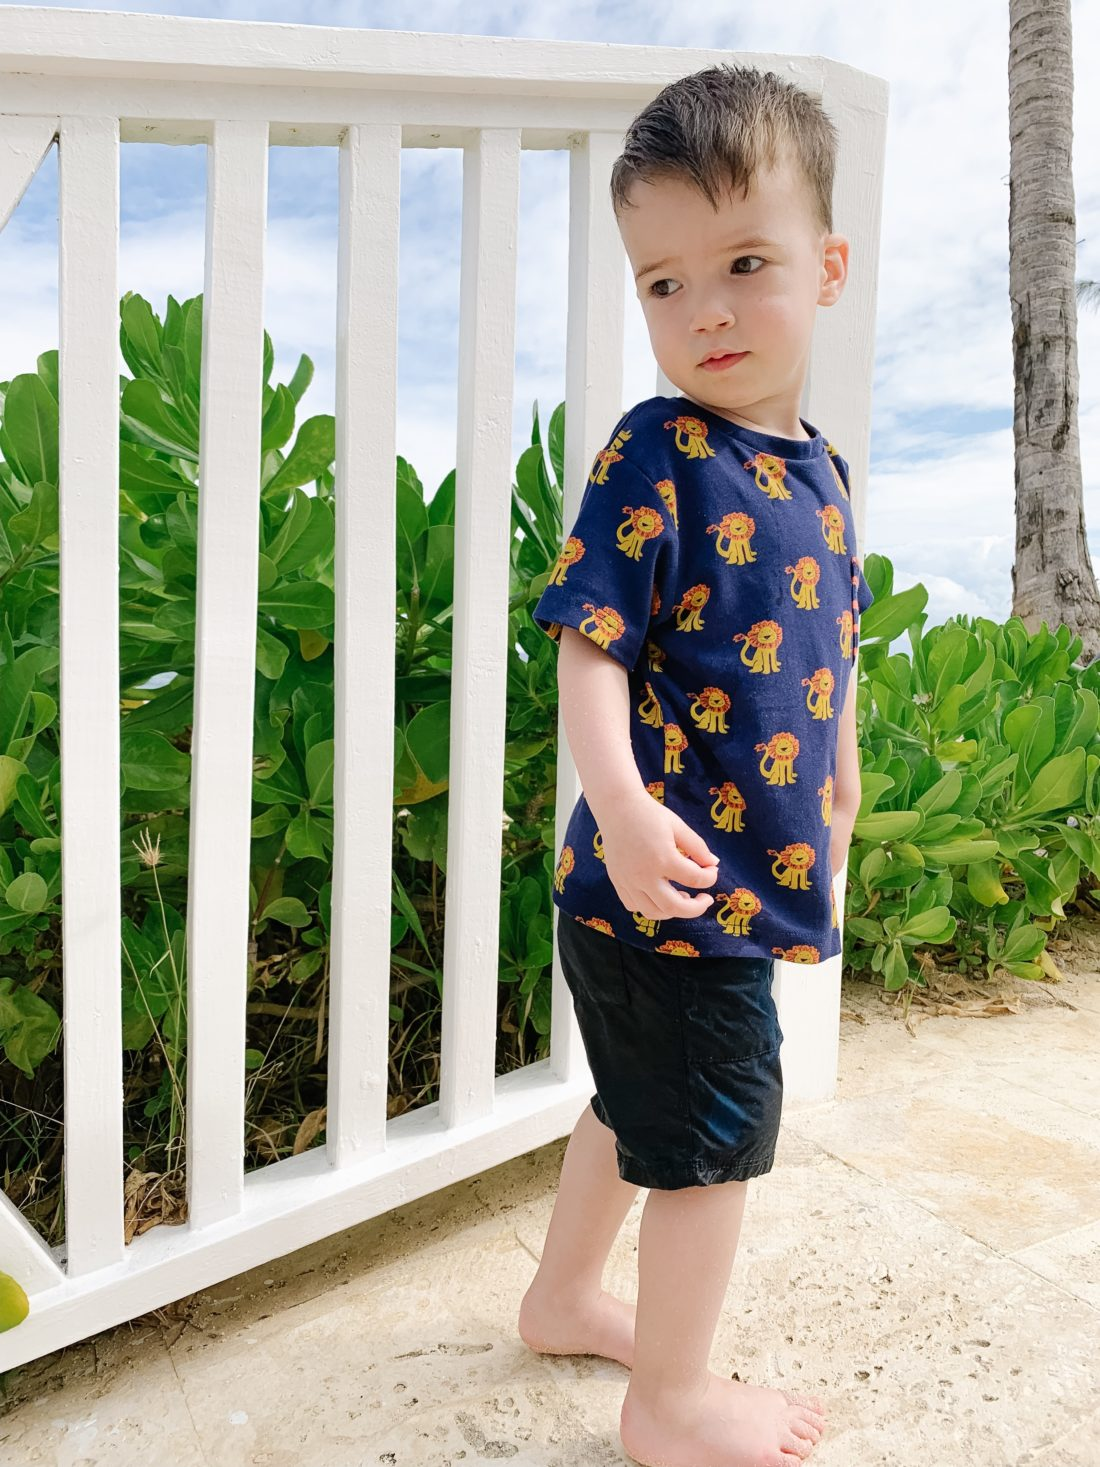 Eva Amurri Martino's son Major enjoying his family trip to Jamaica